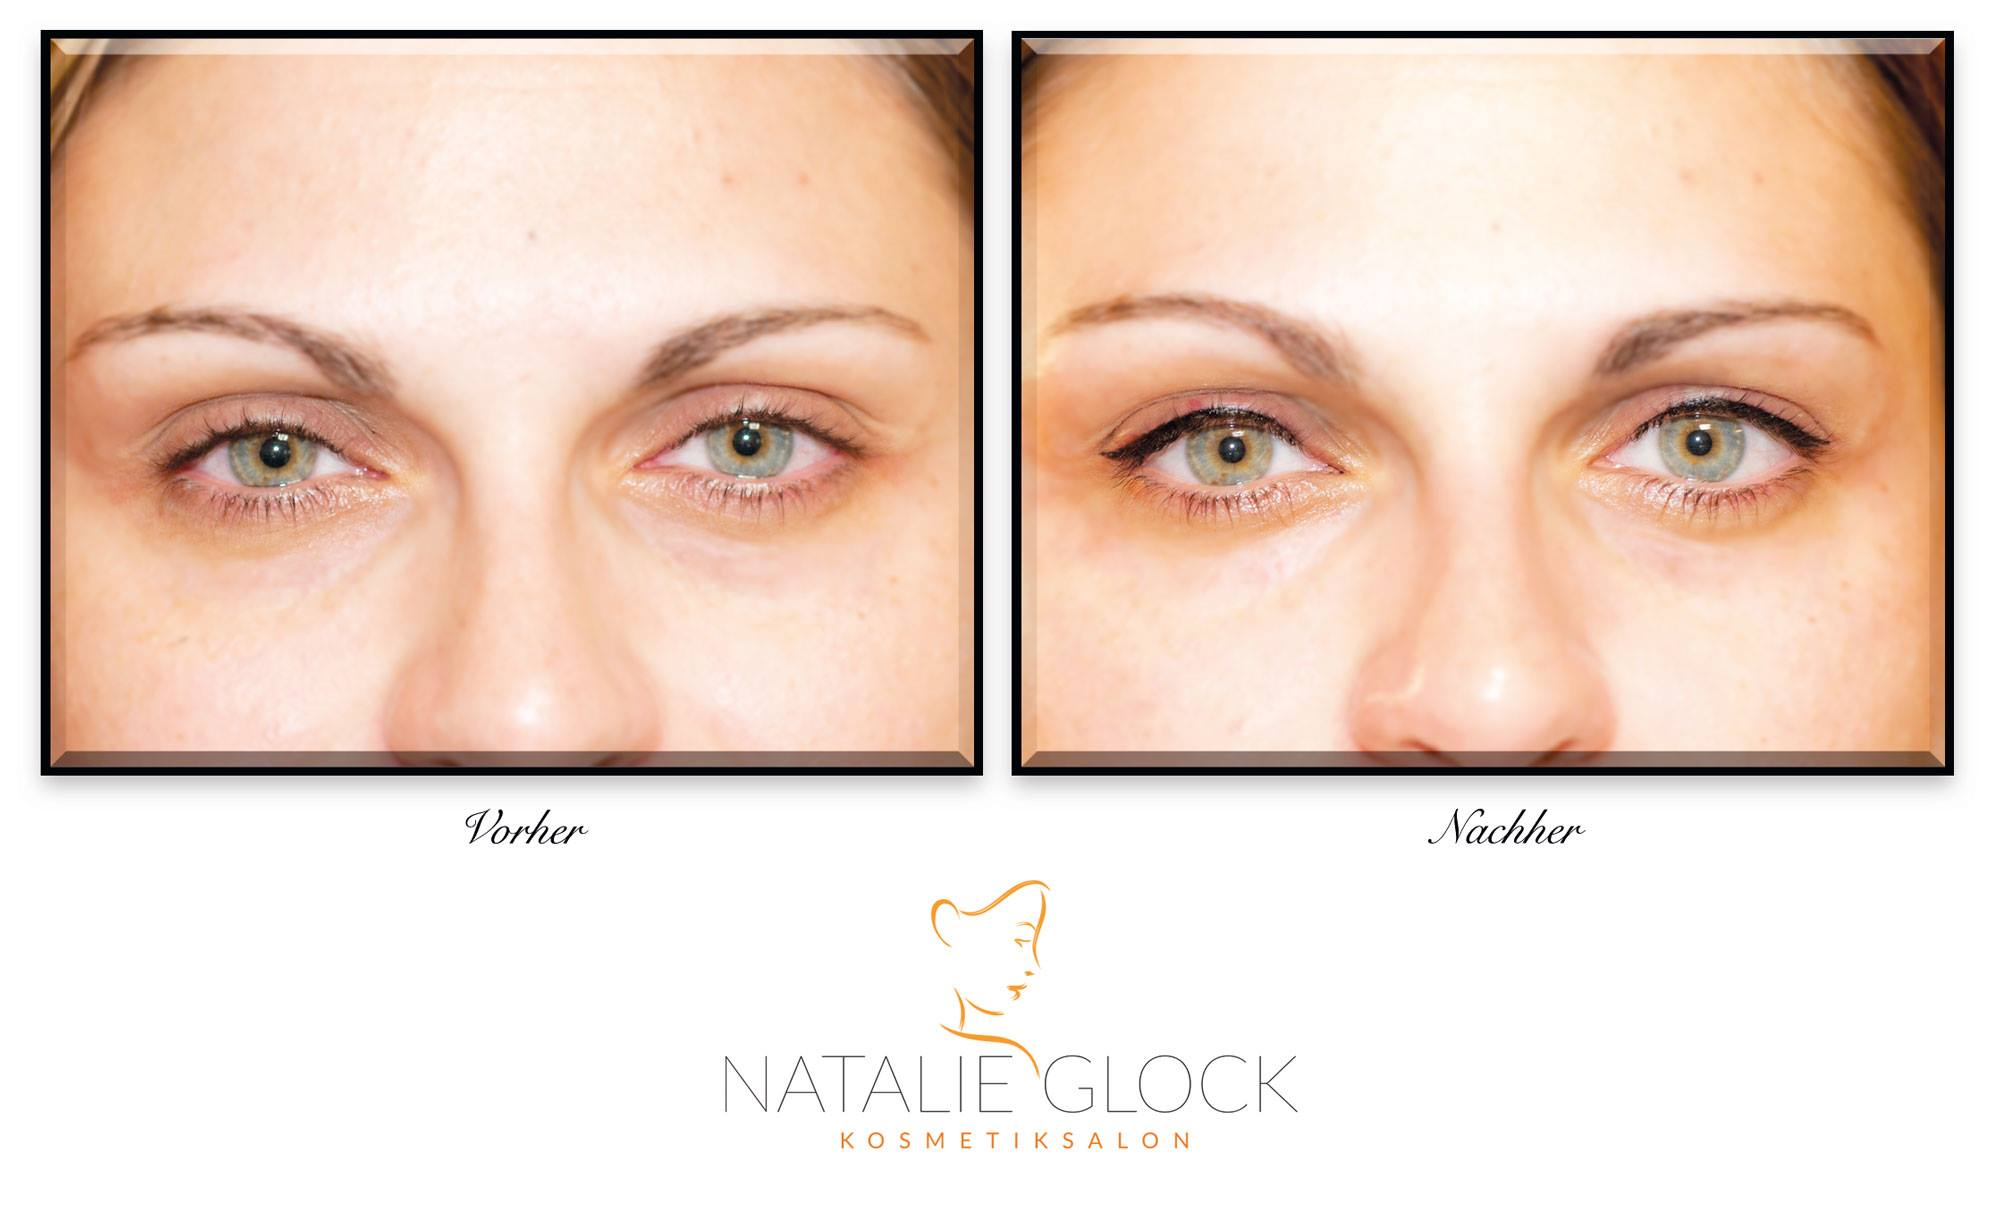 Natalie Glock Kosmetiksalon